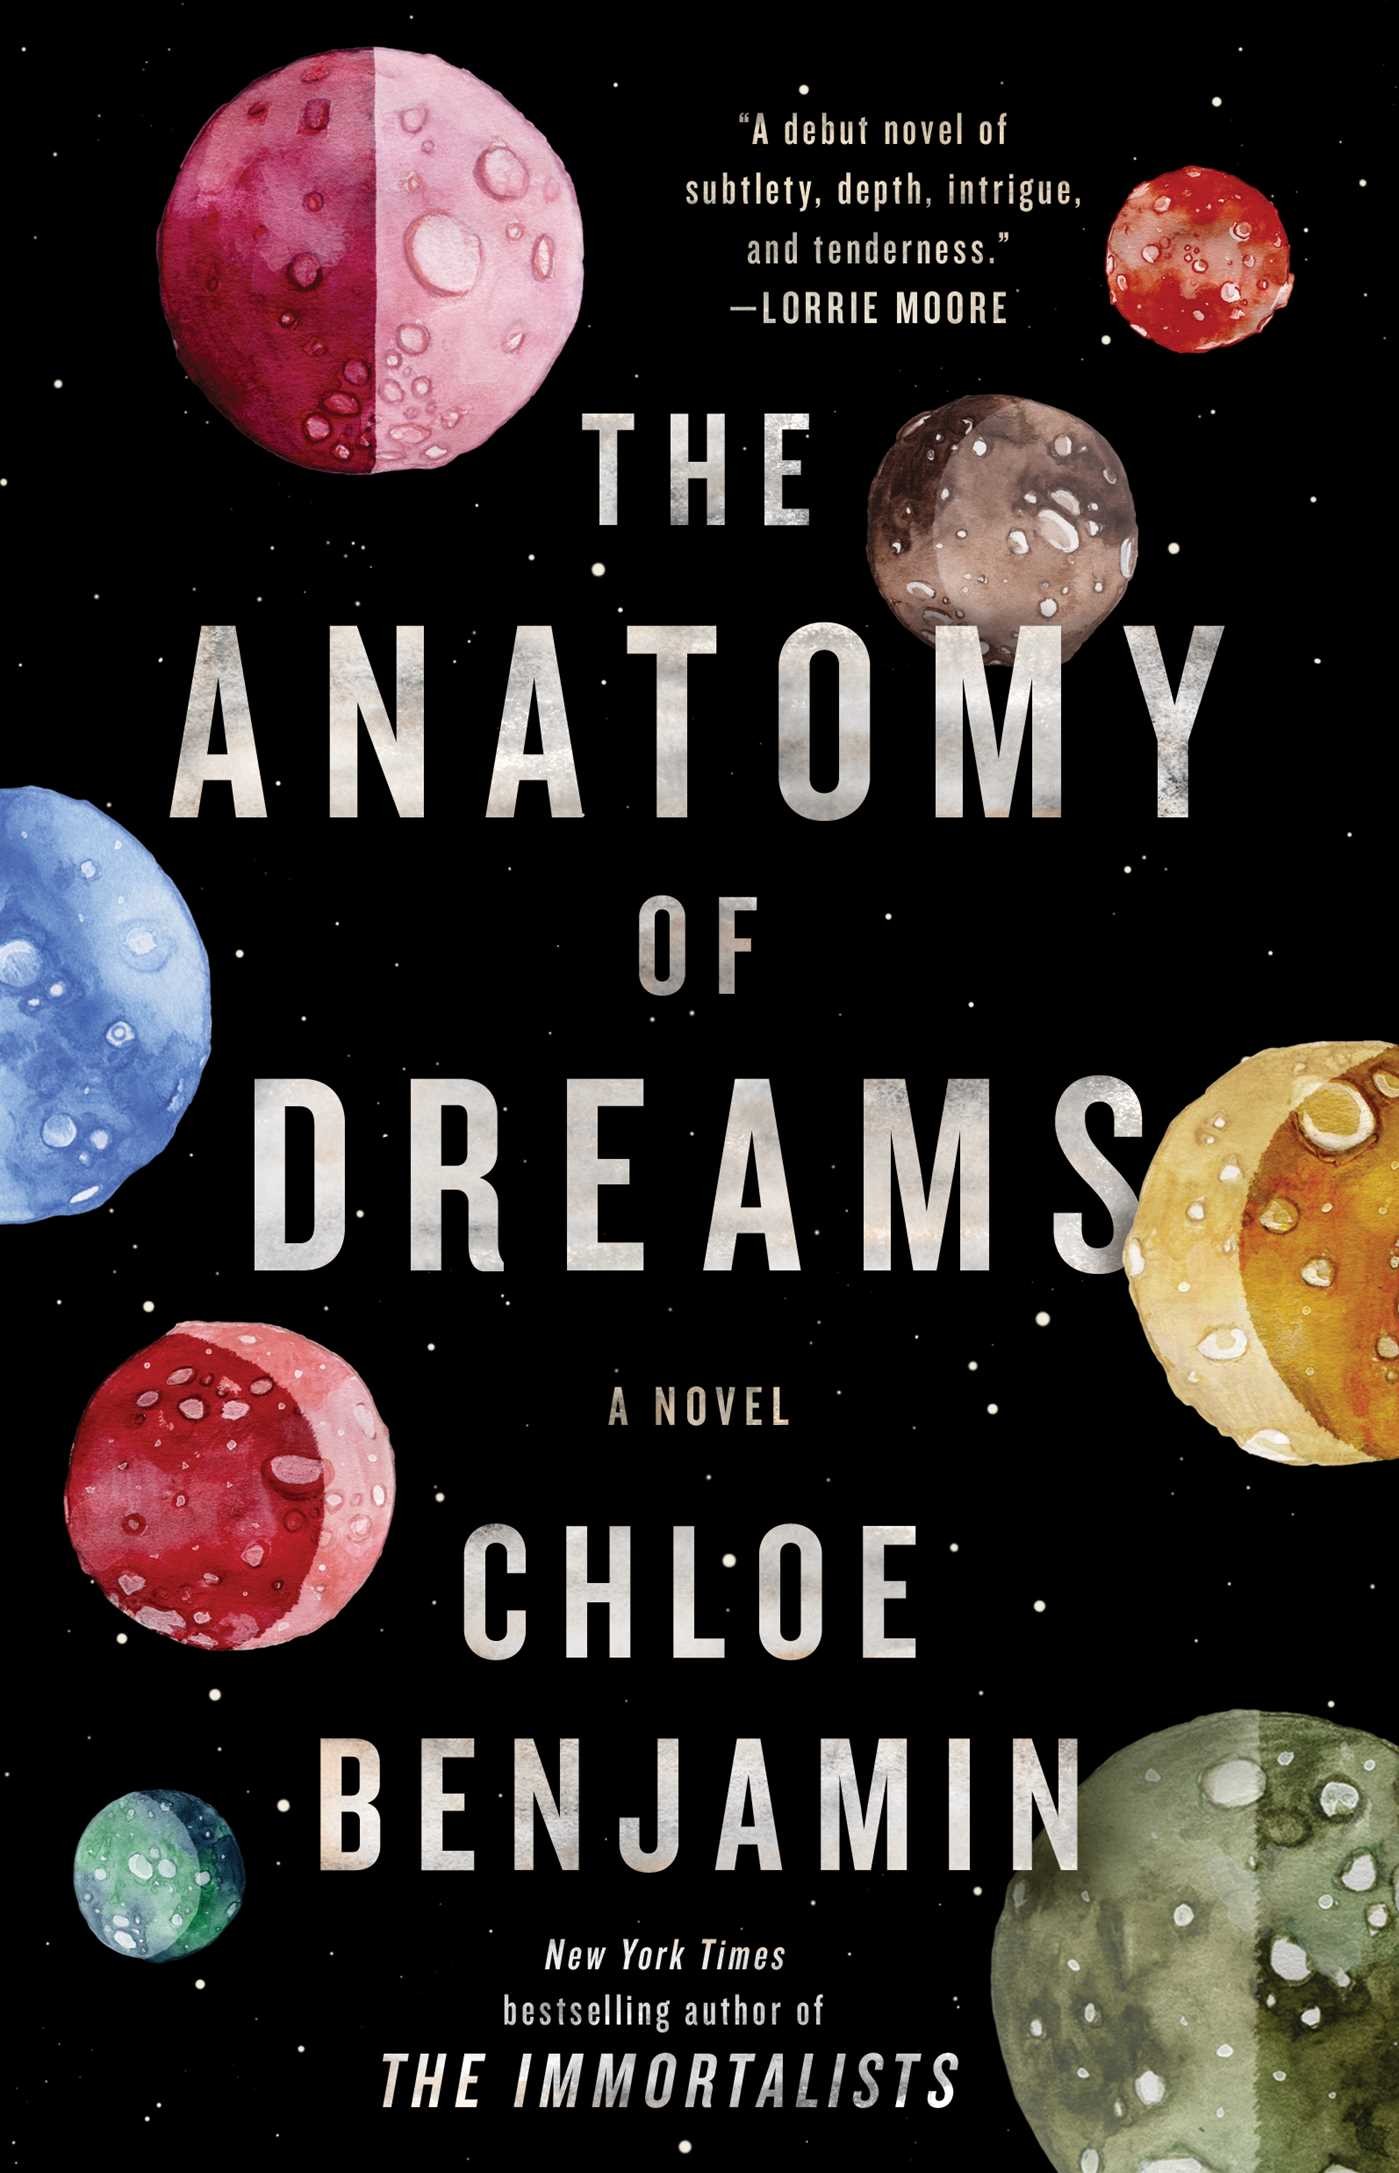 The anatomy of dreams 9781476761176 hr